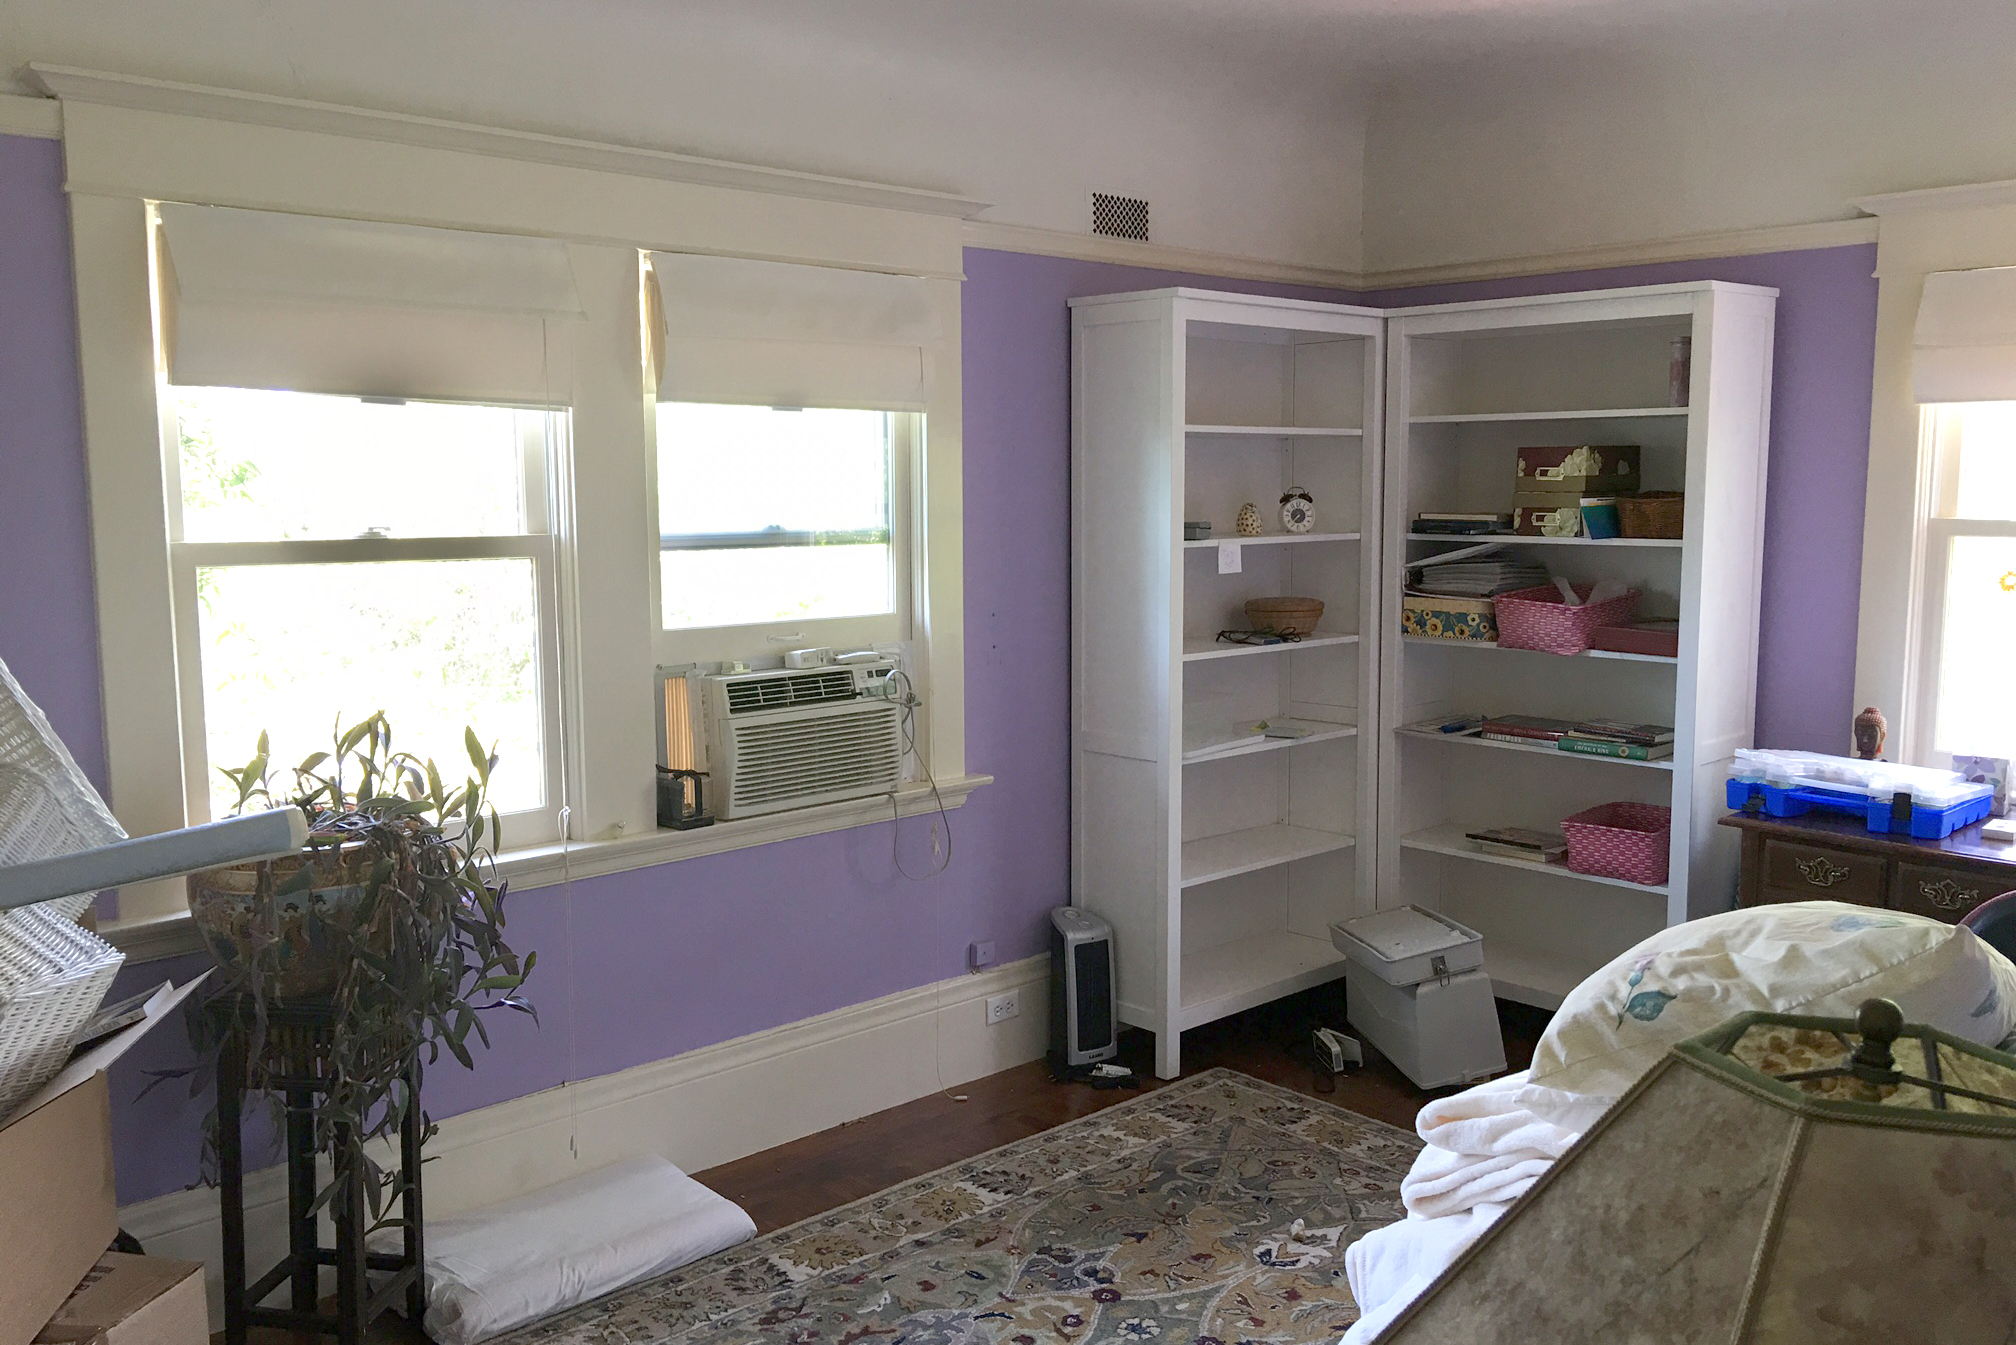 NEW_northwest bedroom before